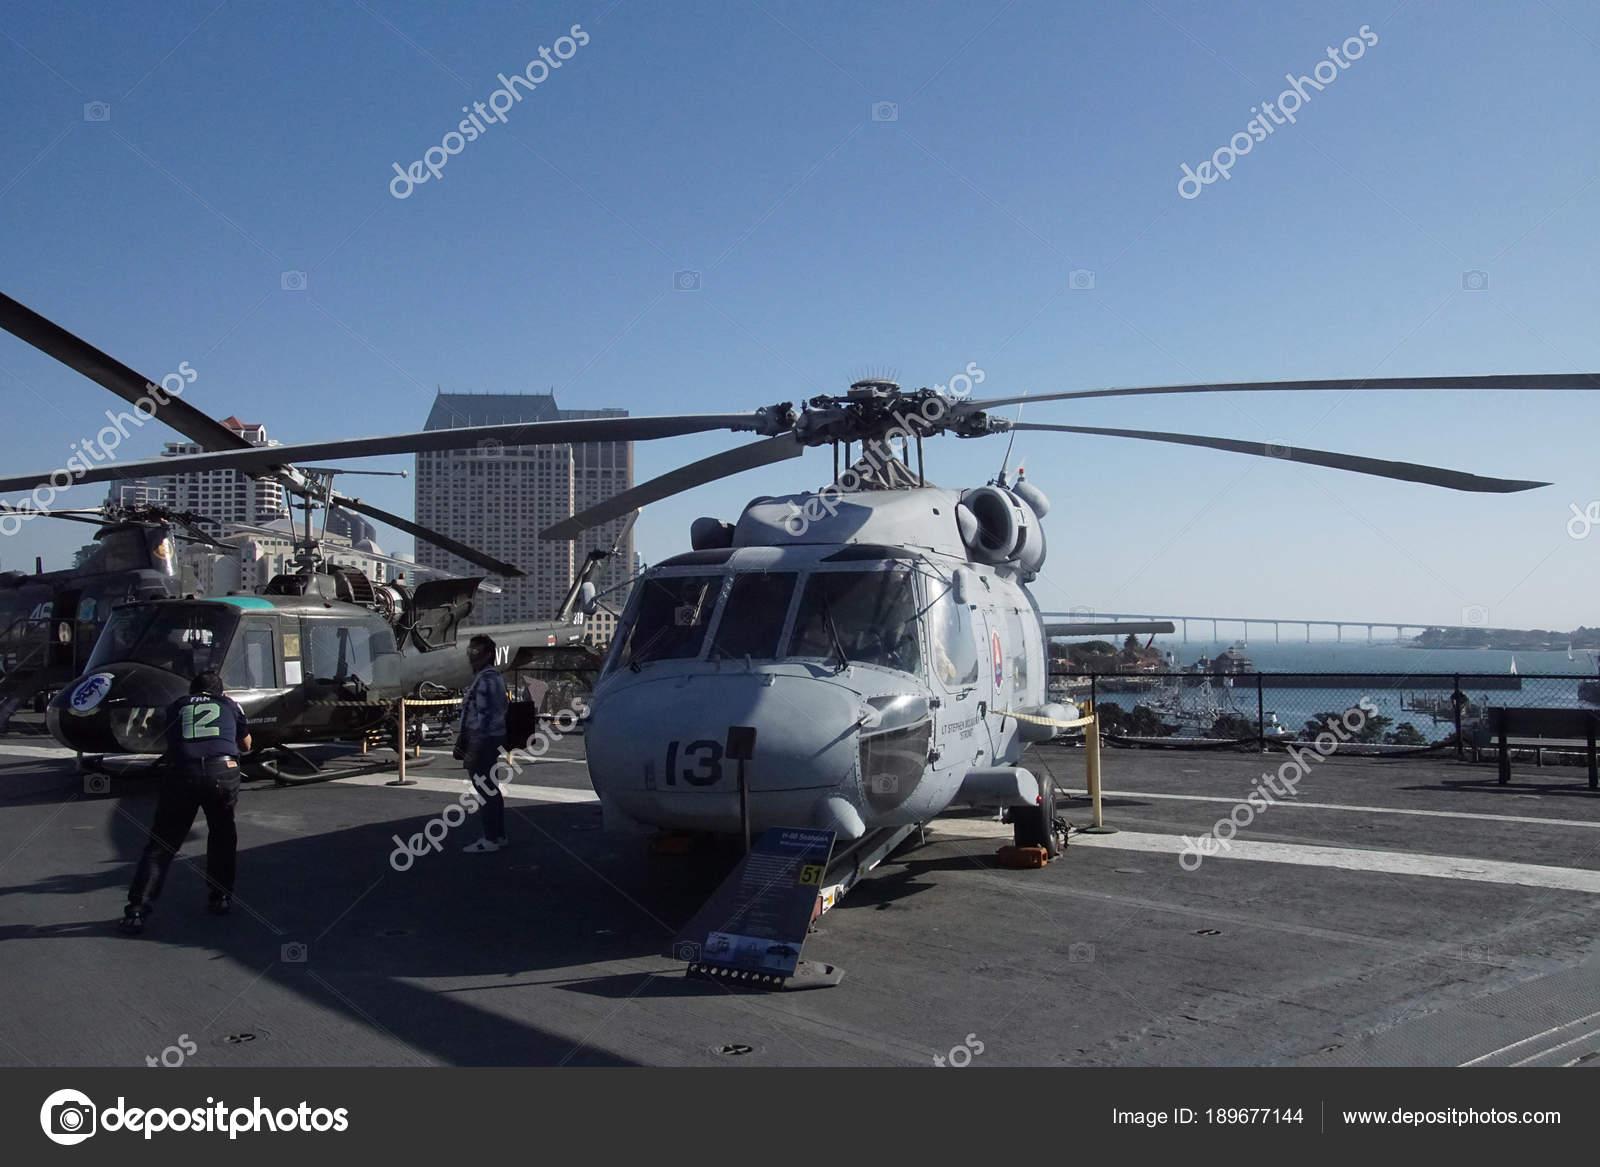 Elicottero H60 : H seahawk elicottero u foto editoriale stock cascoly